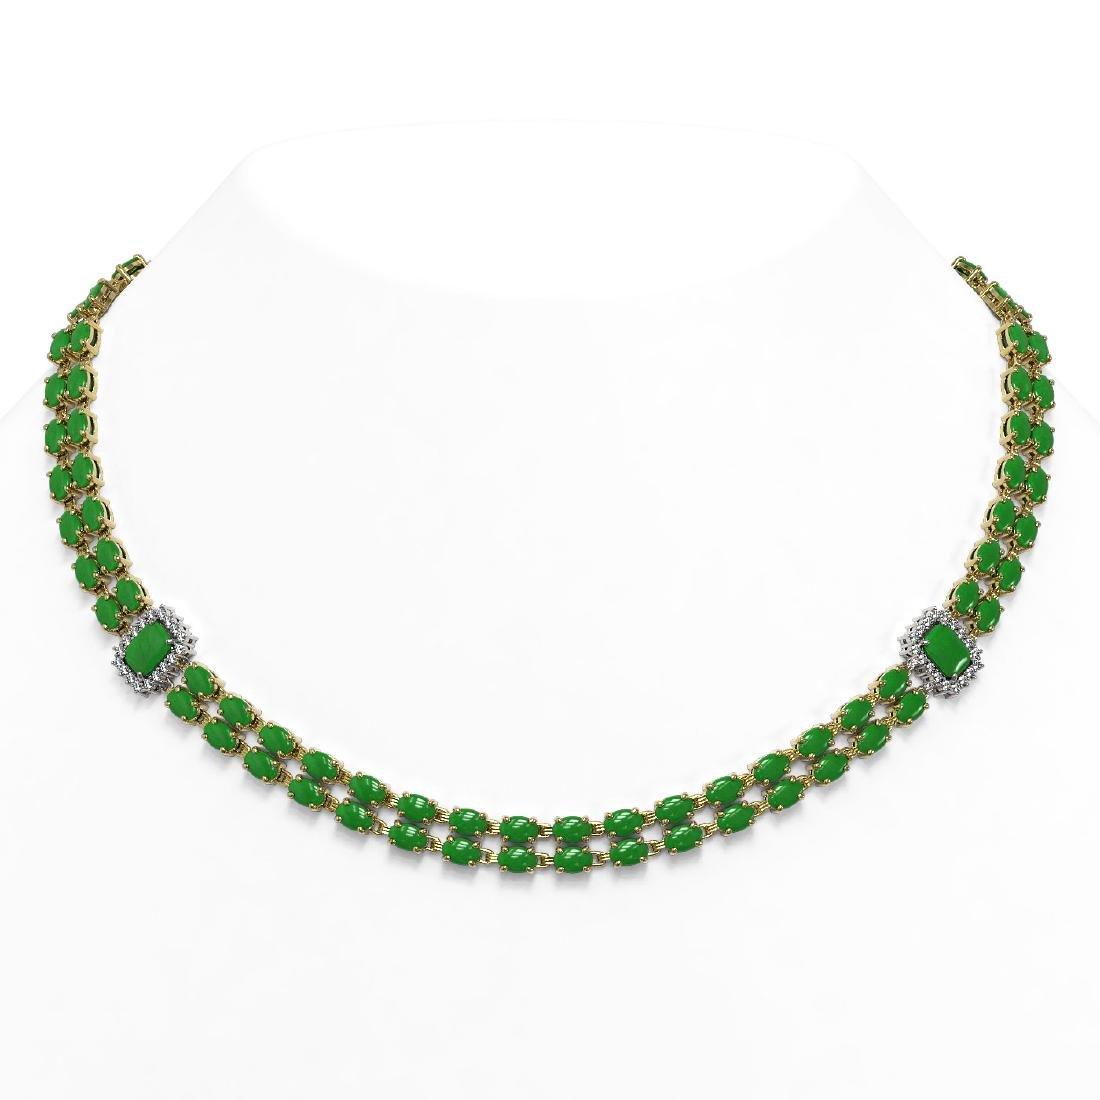 27.5 ctw Jade & Diamond Necklace 14K Yellow Gold -